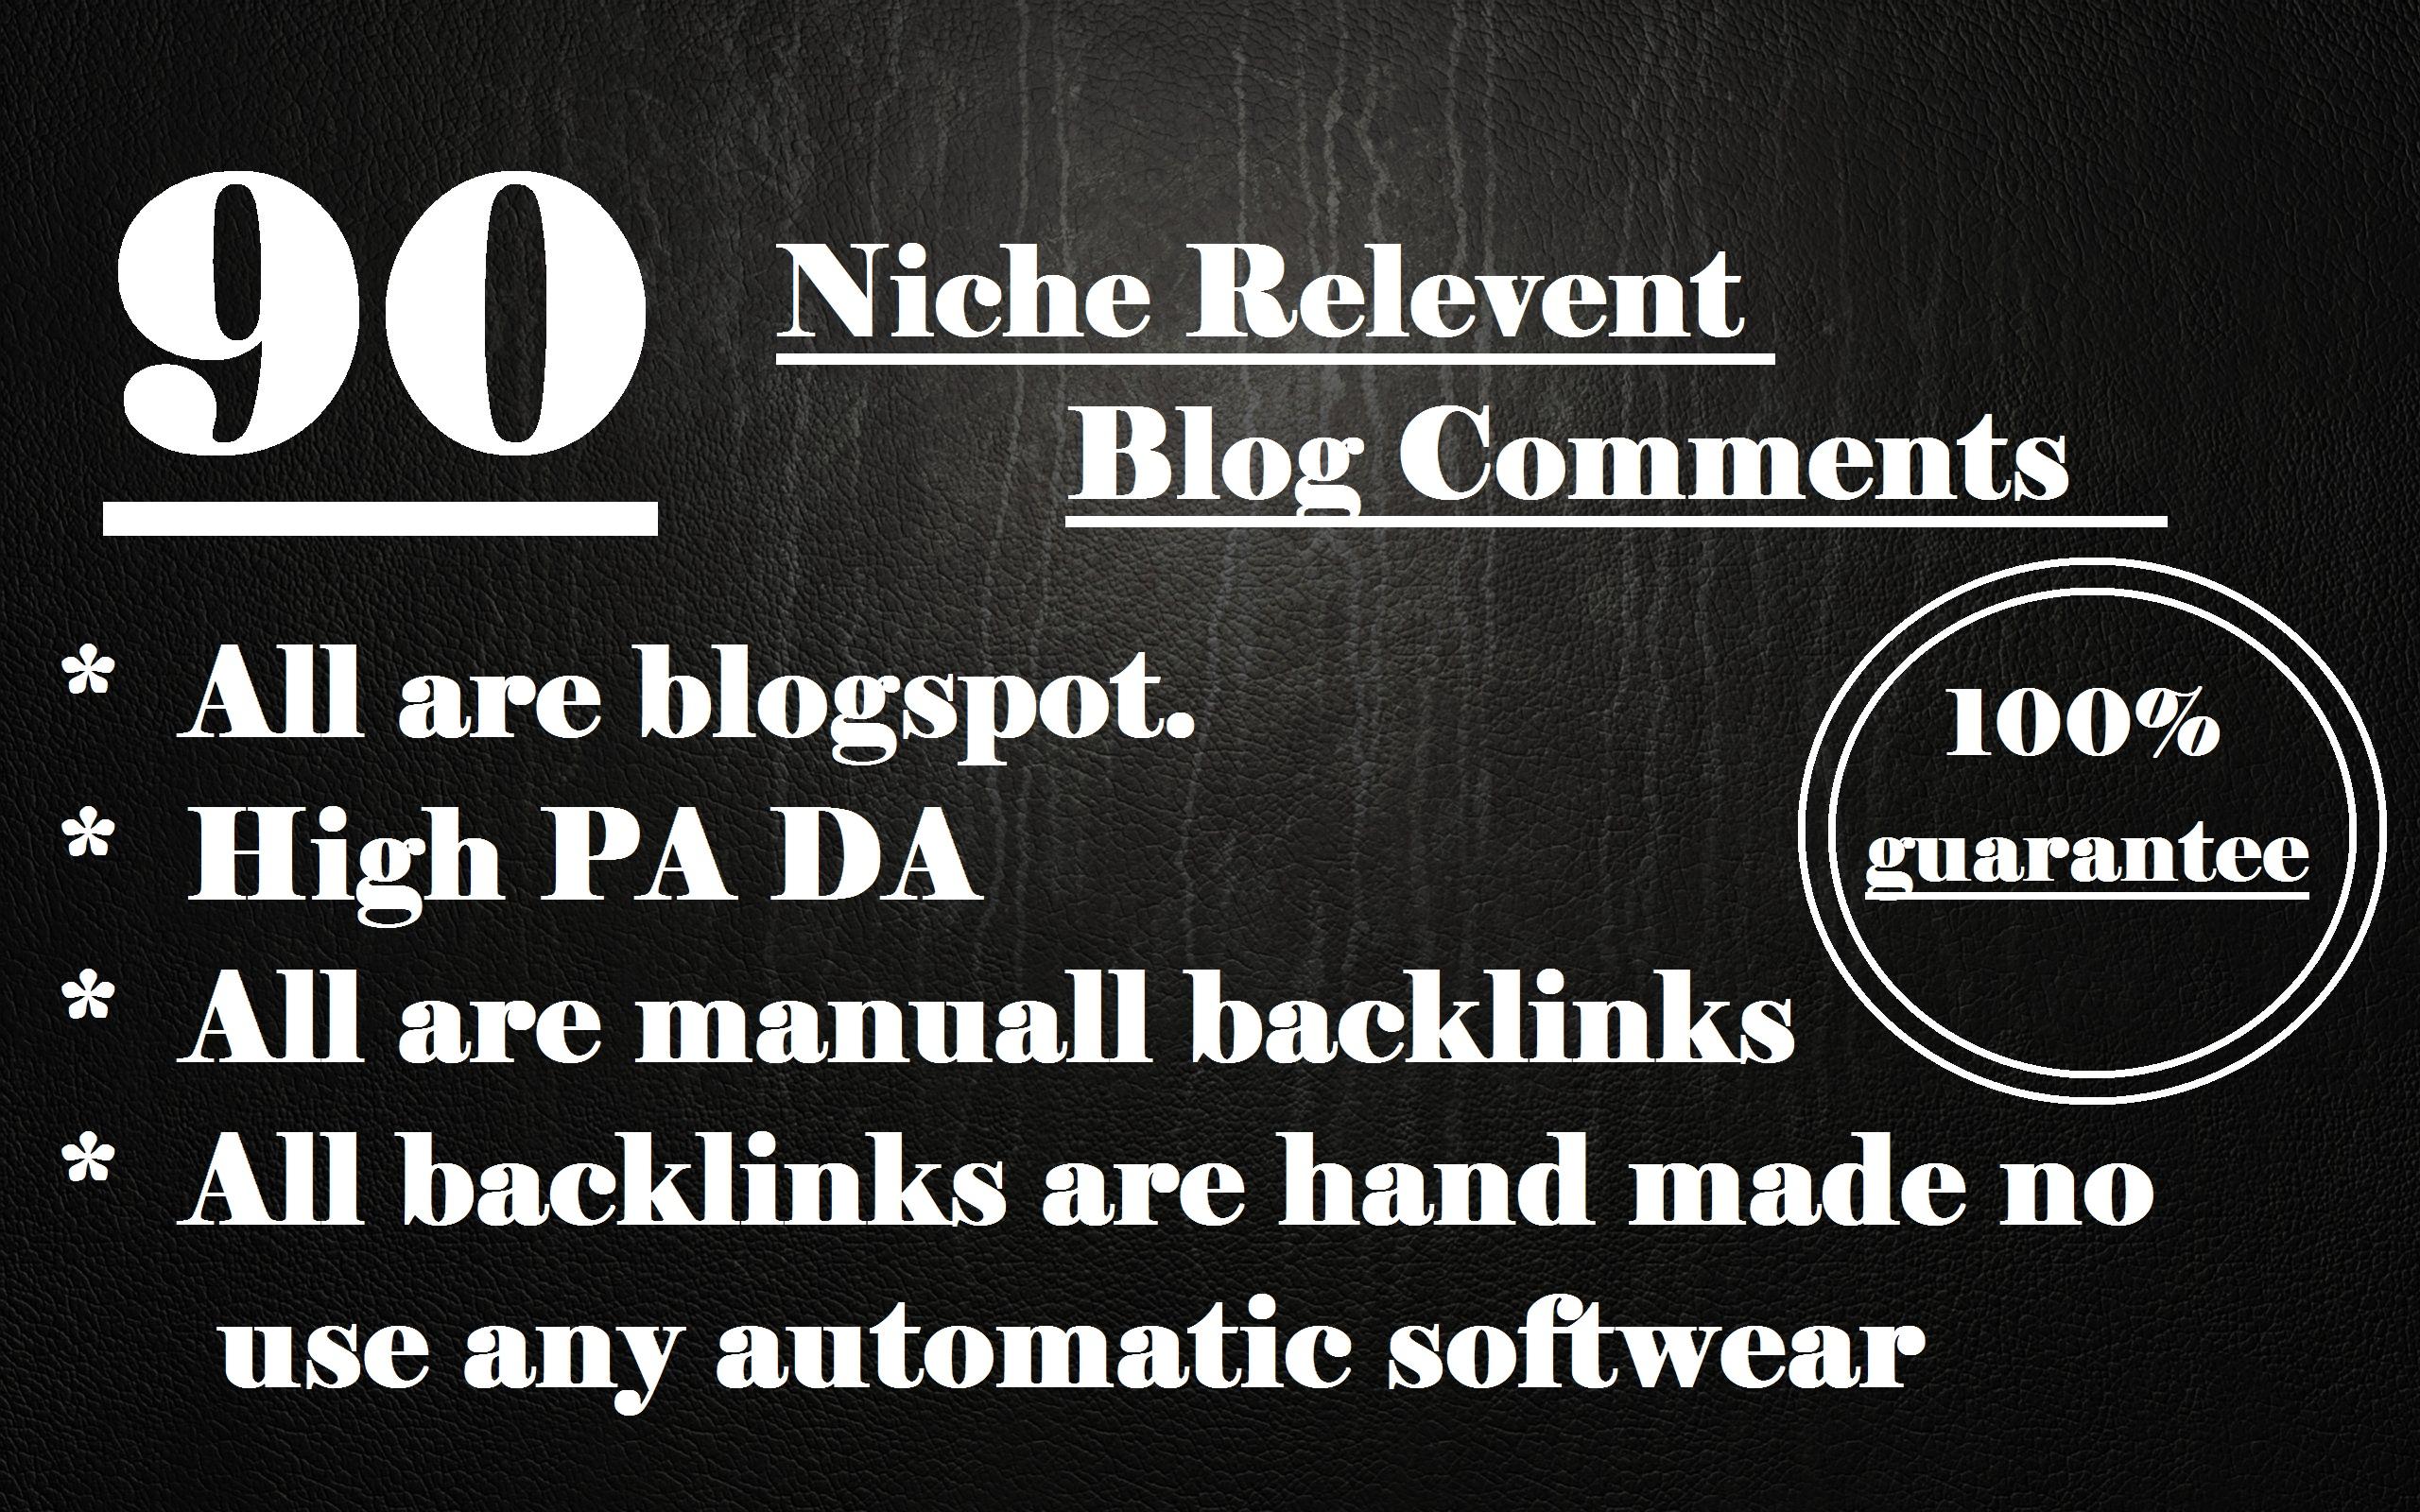 90 Niche Relevent Blog Comments